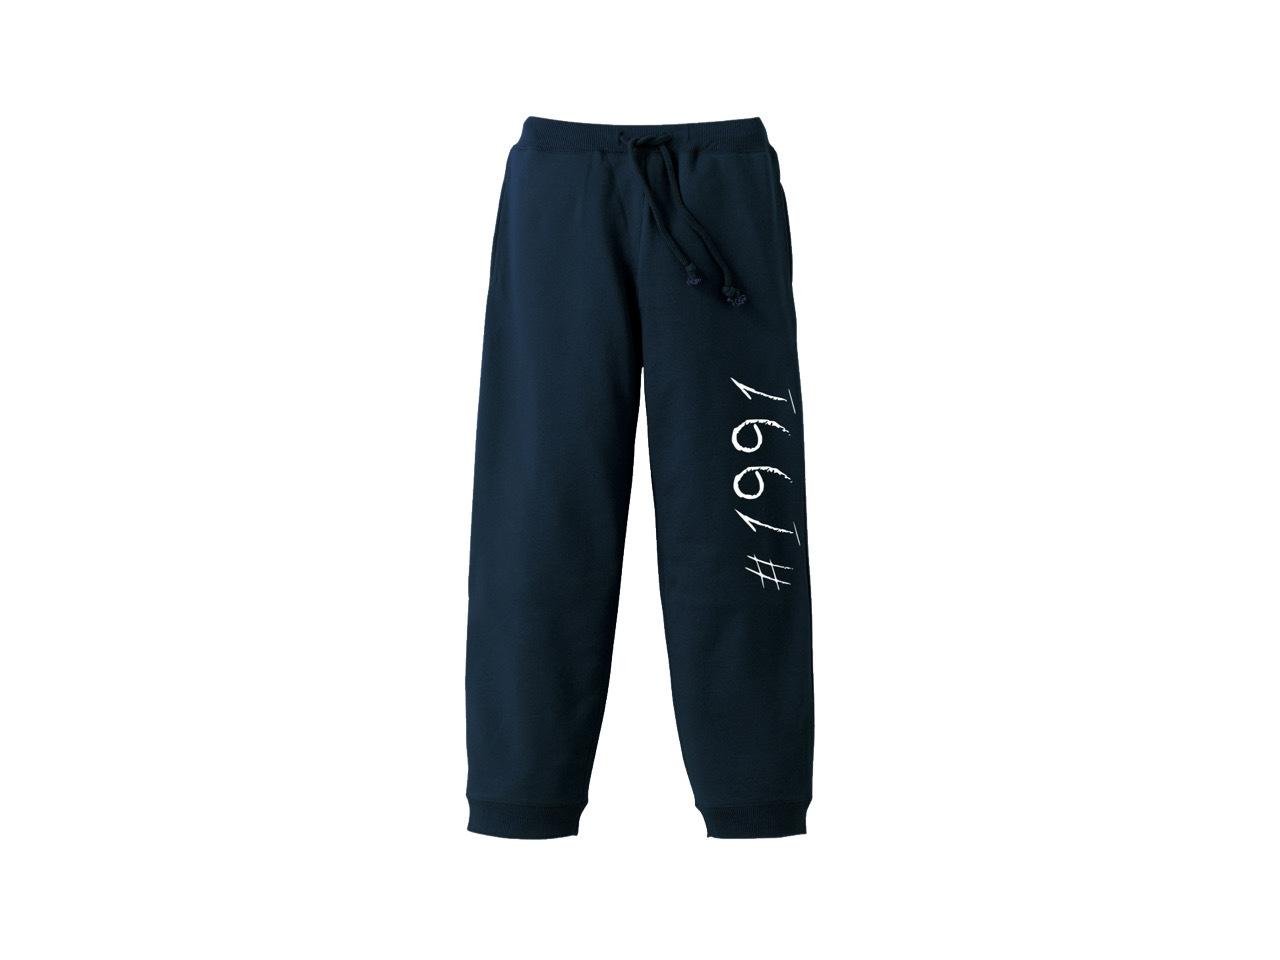 1991 sweat pants (NVY)